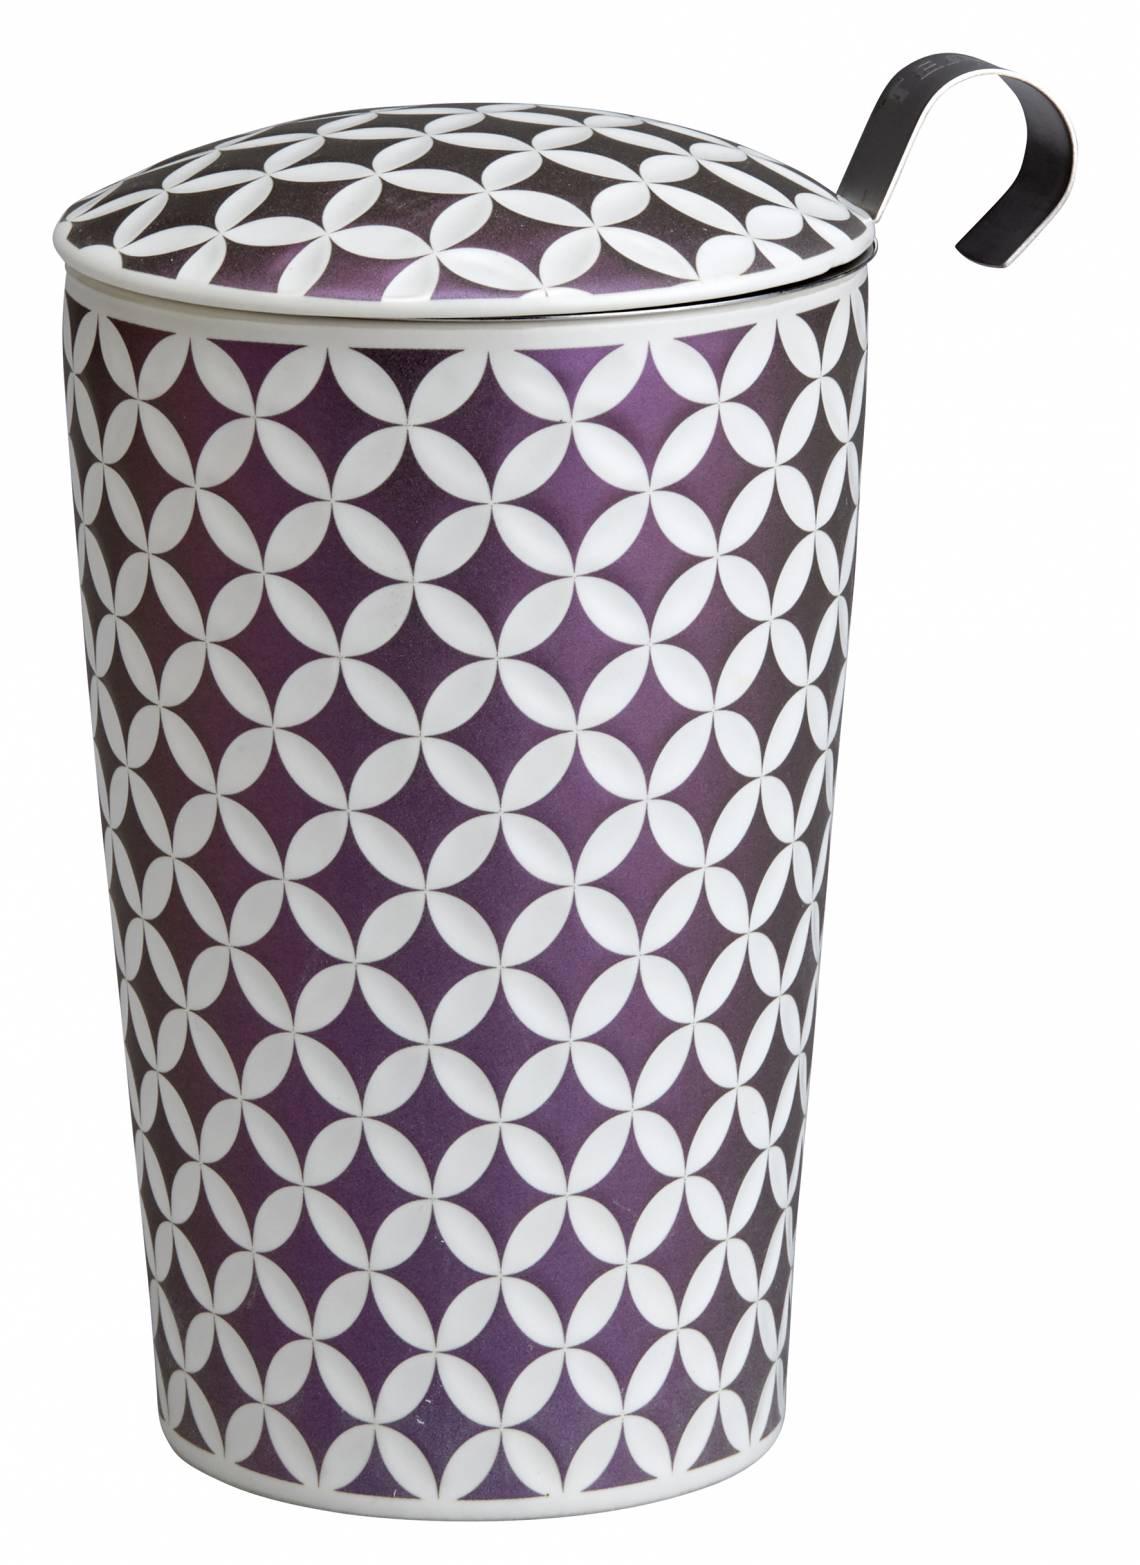 Eigenart May Lin TEAEVE Porzellanbecher lila - 80037